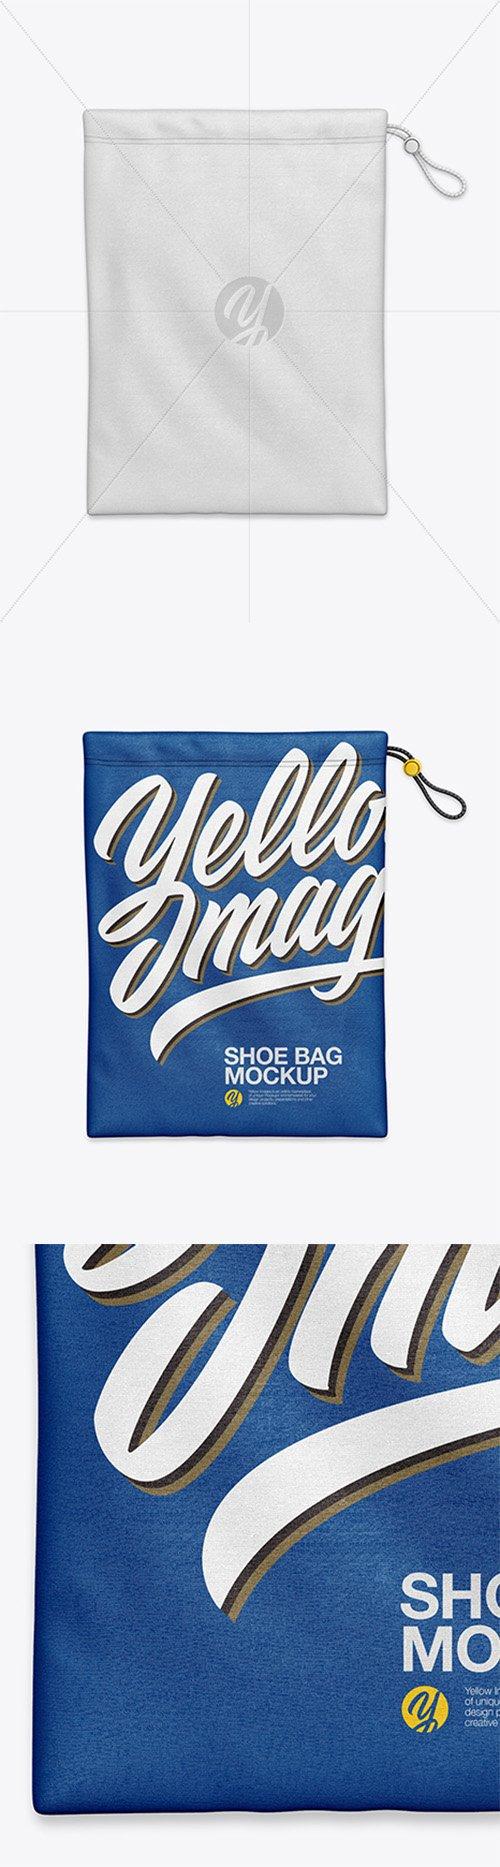 Shoe Bag Mockup 23574 TIF